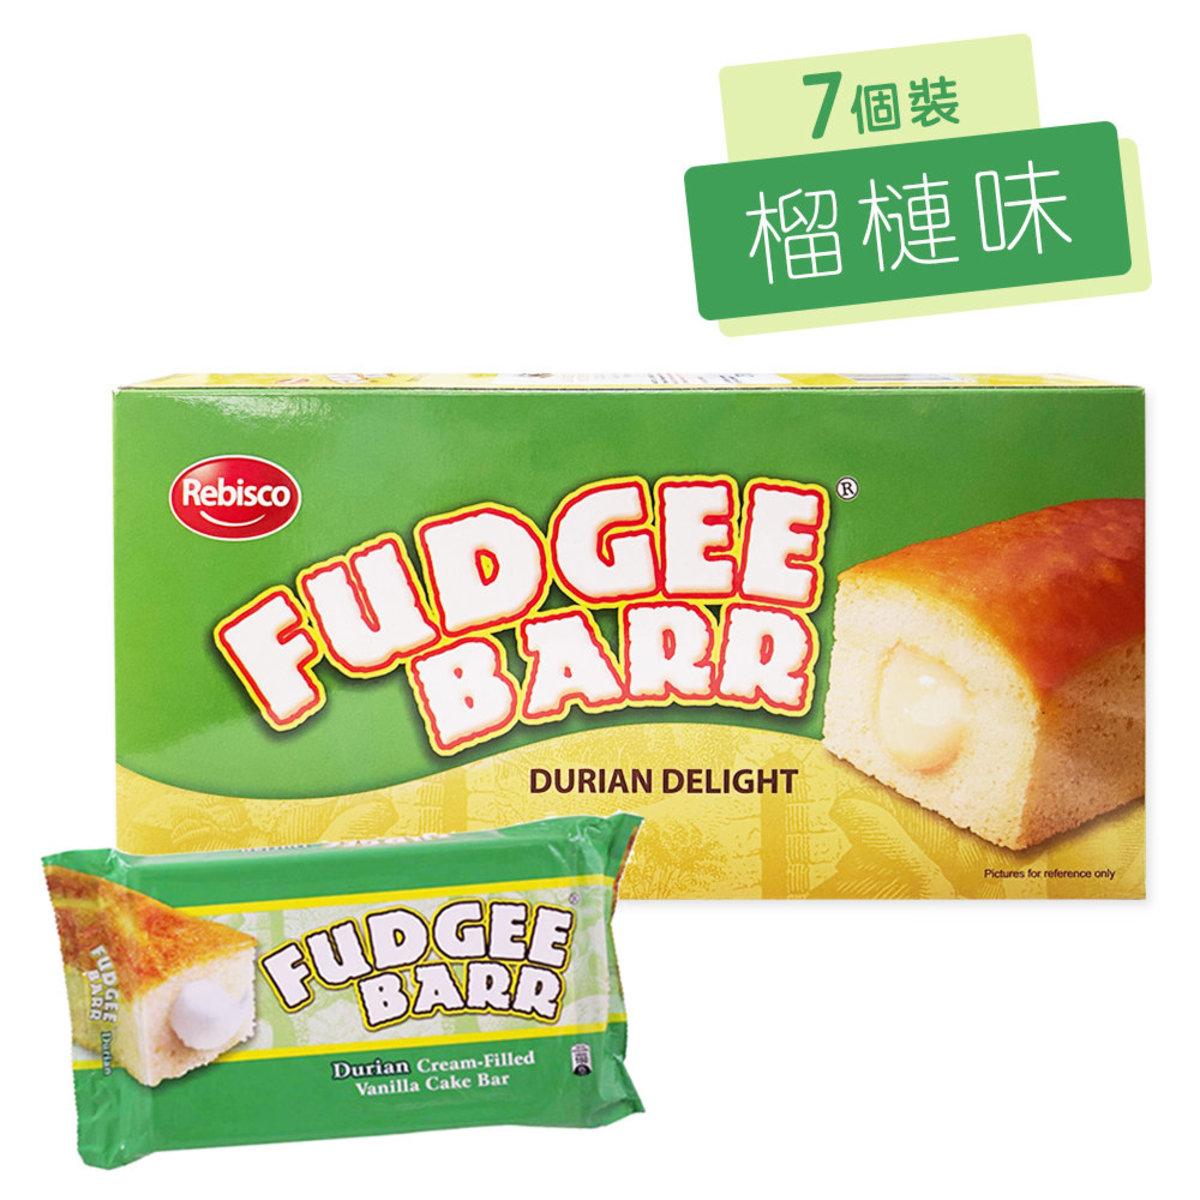 Fudgee Barr 榴槤味蛋糕 (7個/盒)